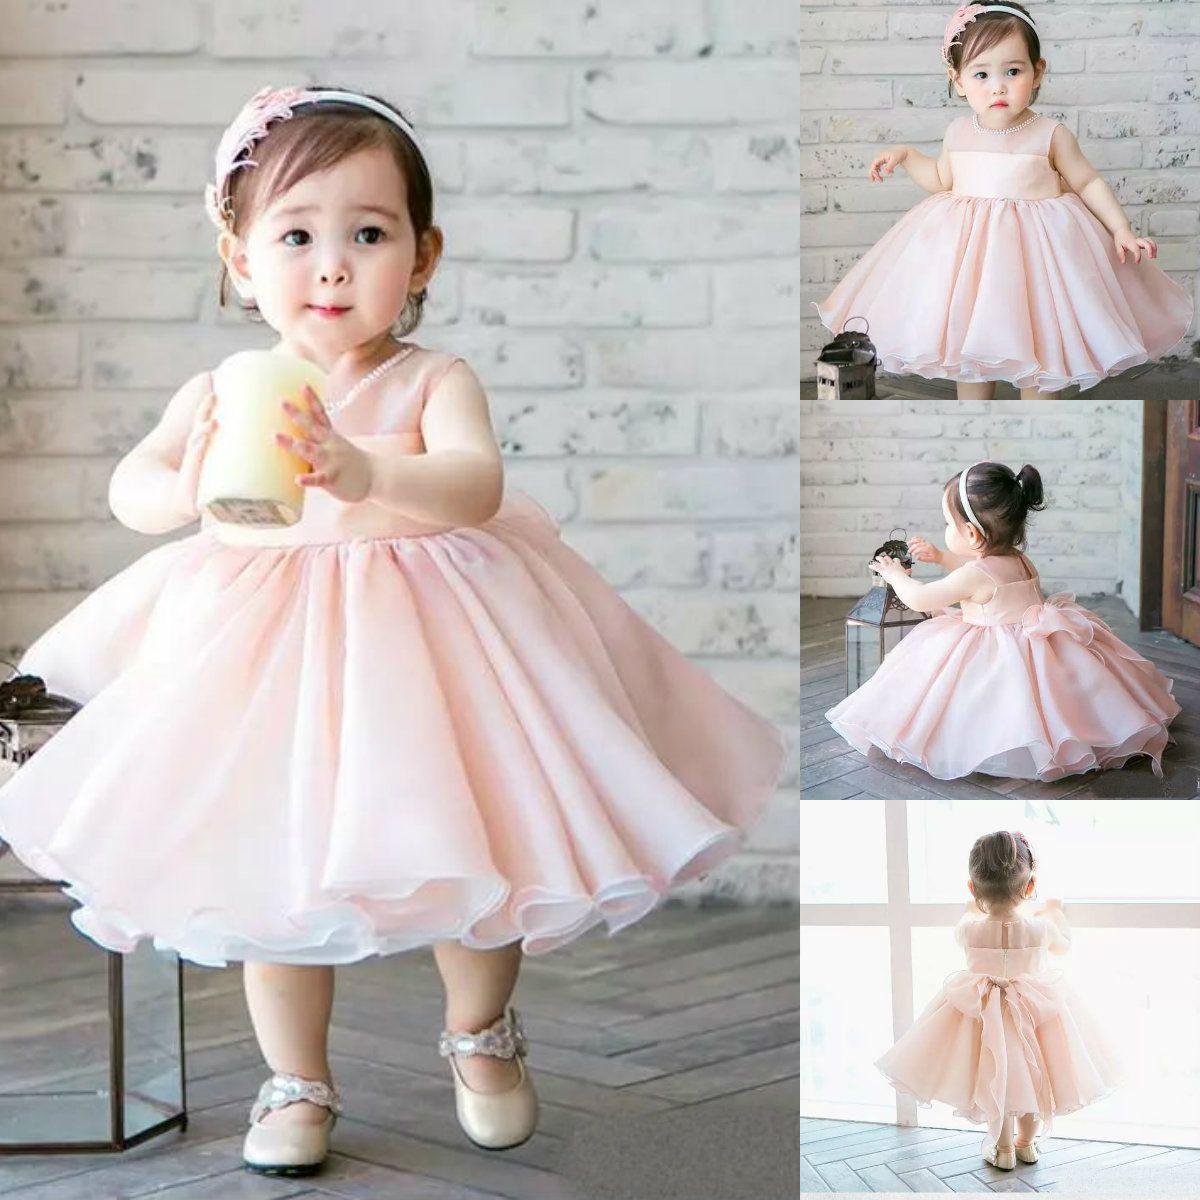 2bb79da5e Pink Adorable Flower Girl Dresses Jewel Neck Beads Sleeveless Ball ...